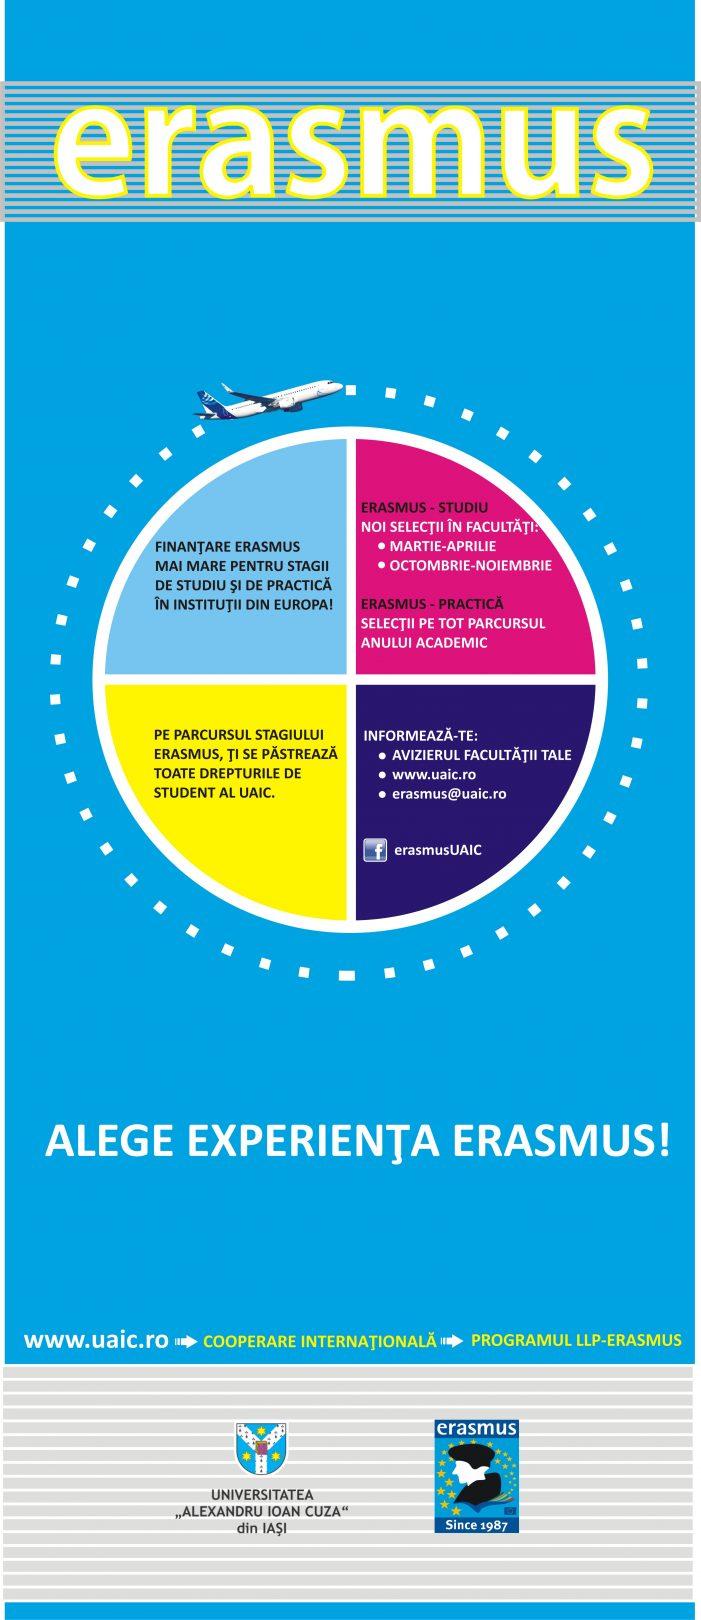 Trăieşte experienţa Erasmus